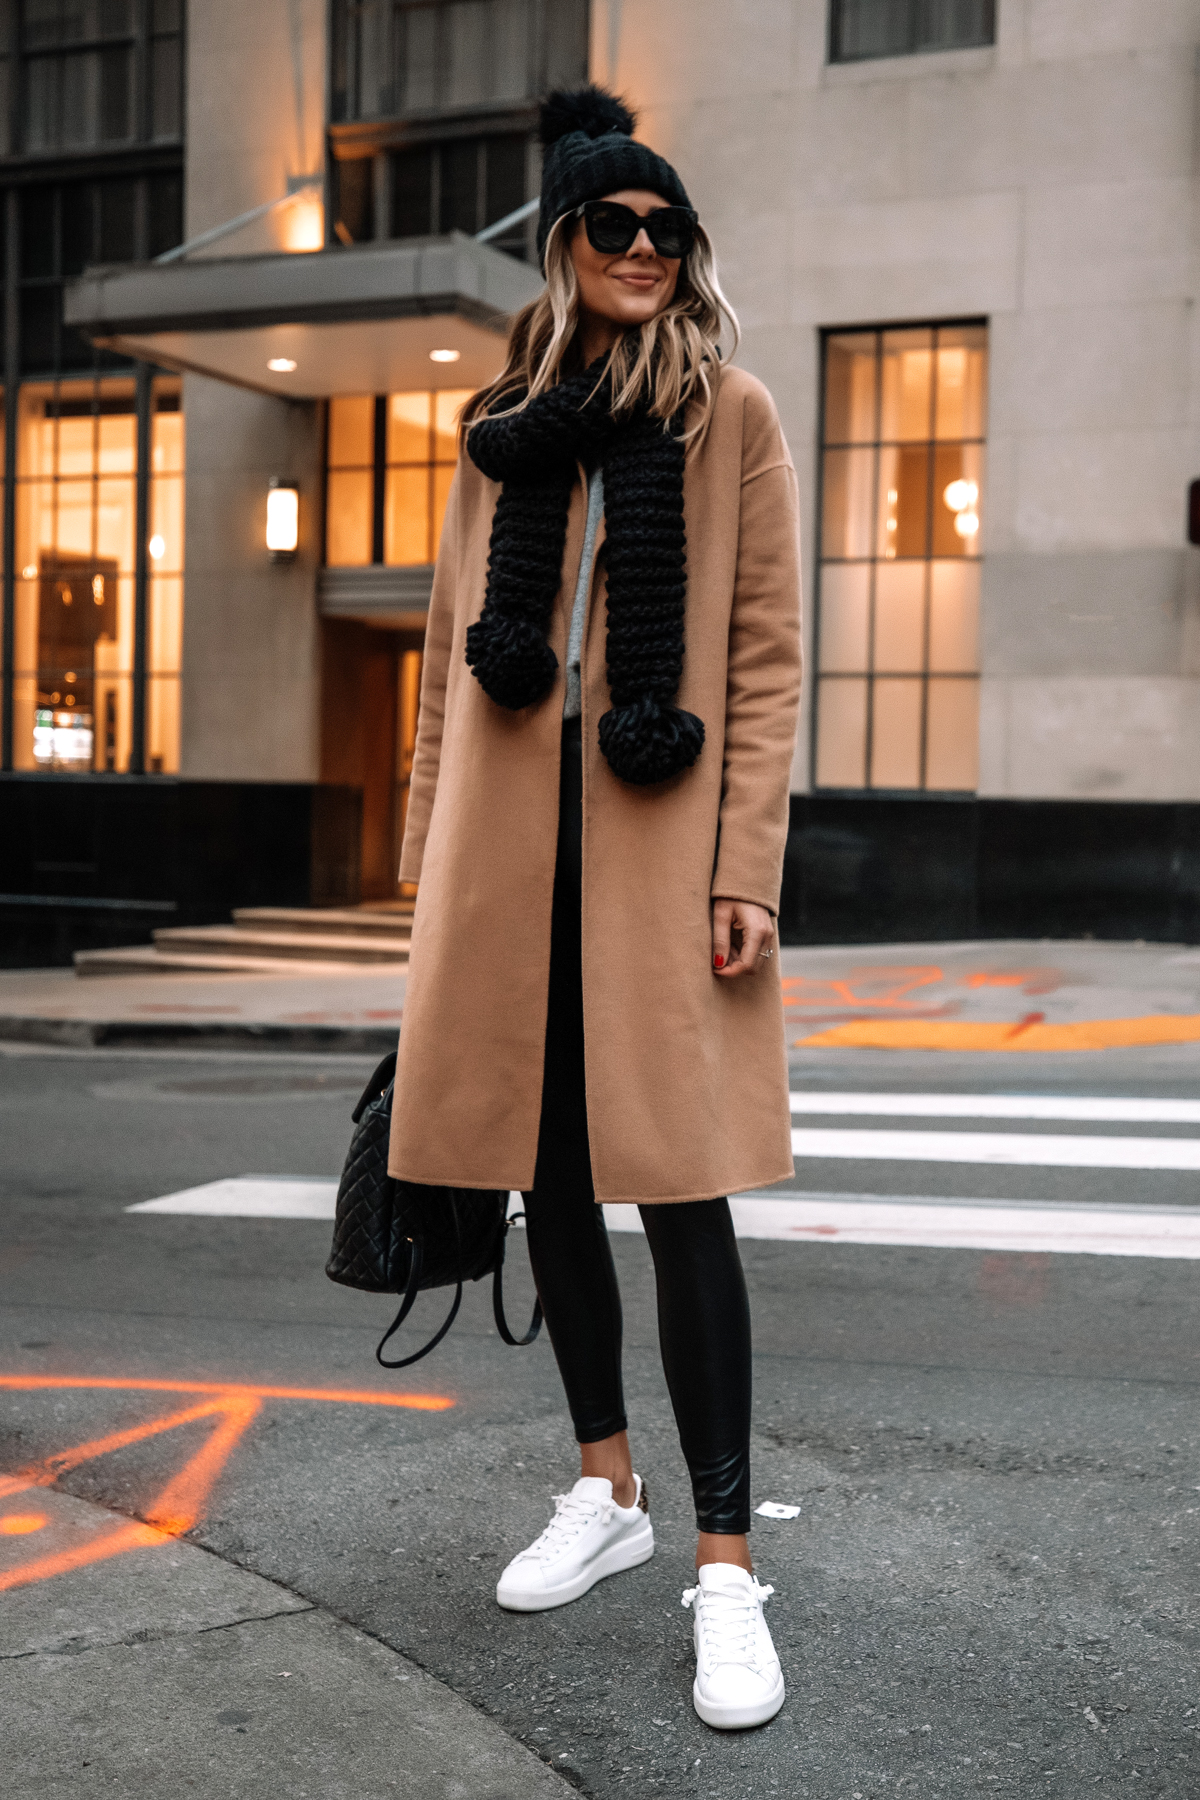 Fashion Jackson Wearing Express Camel Coat Black Faux Leather Leggings White Sneakers Black Scarf Black Beanie Street Style 1